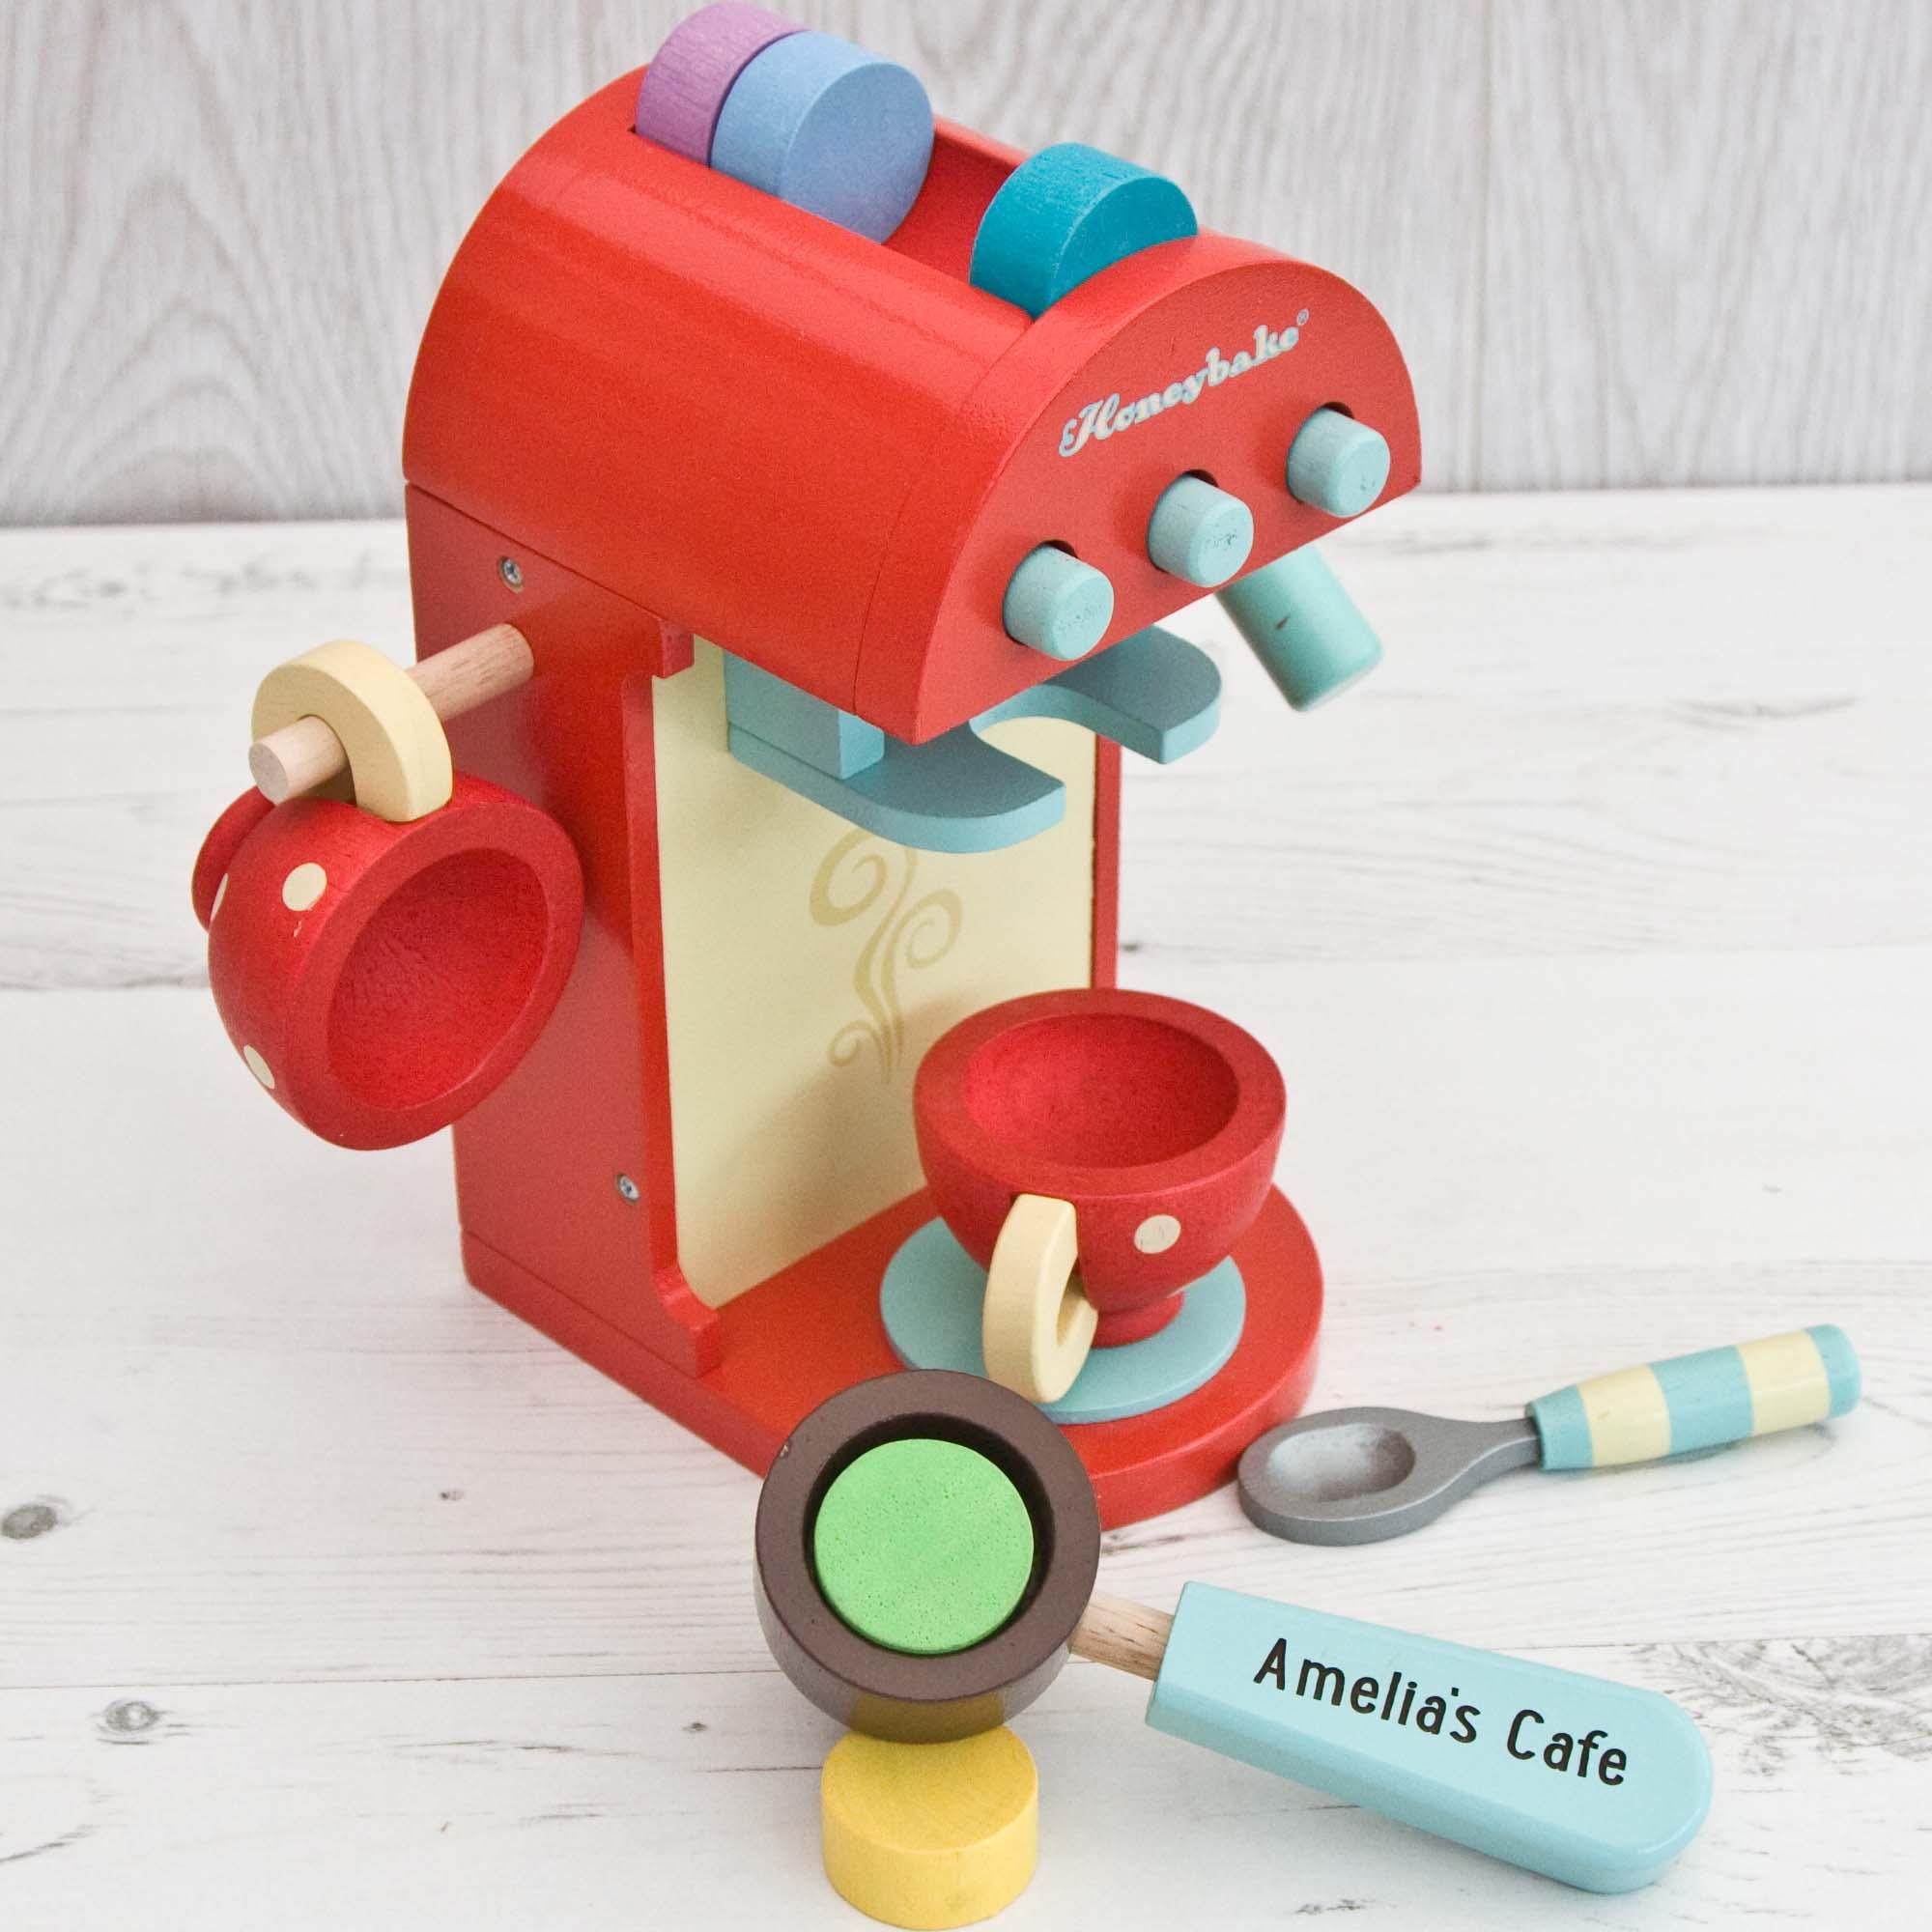 honeybake-cafe-coffee-machine-personalised-toy-19595-p.jpg